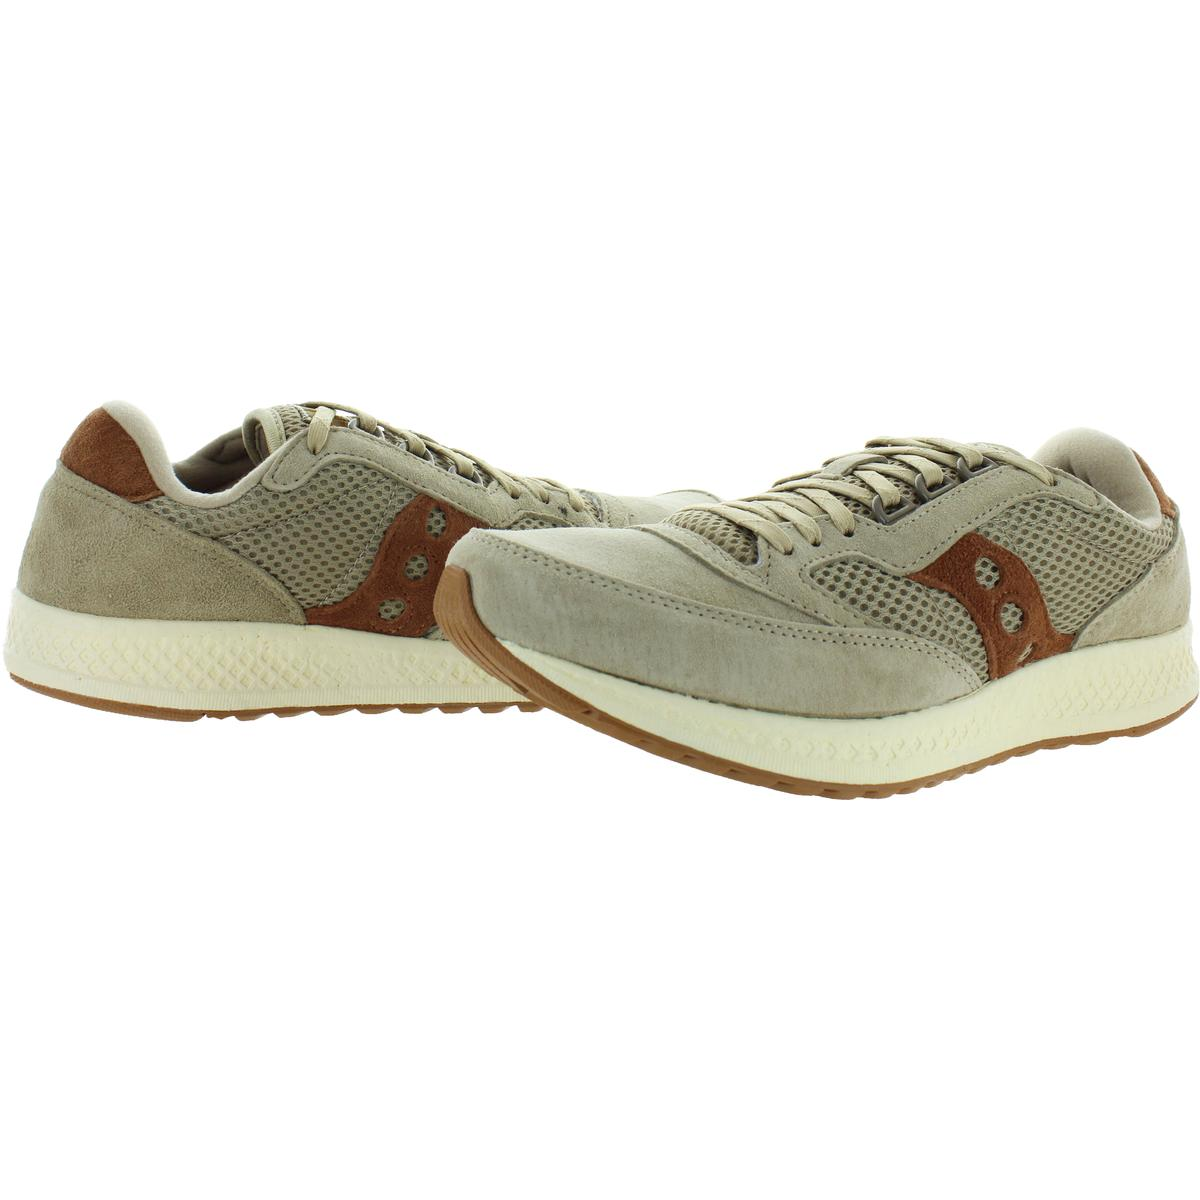 Saucony-Mens-Freedom-Runner-Tan-Running-Shoes-Sneakers-7-Medium-D-BHFO-4411 thumbnail 5